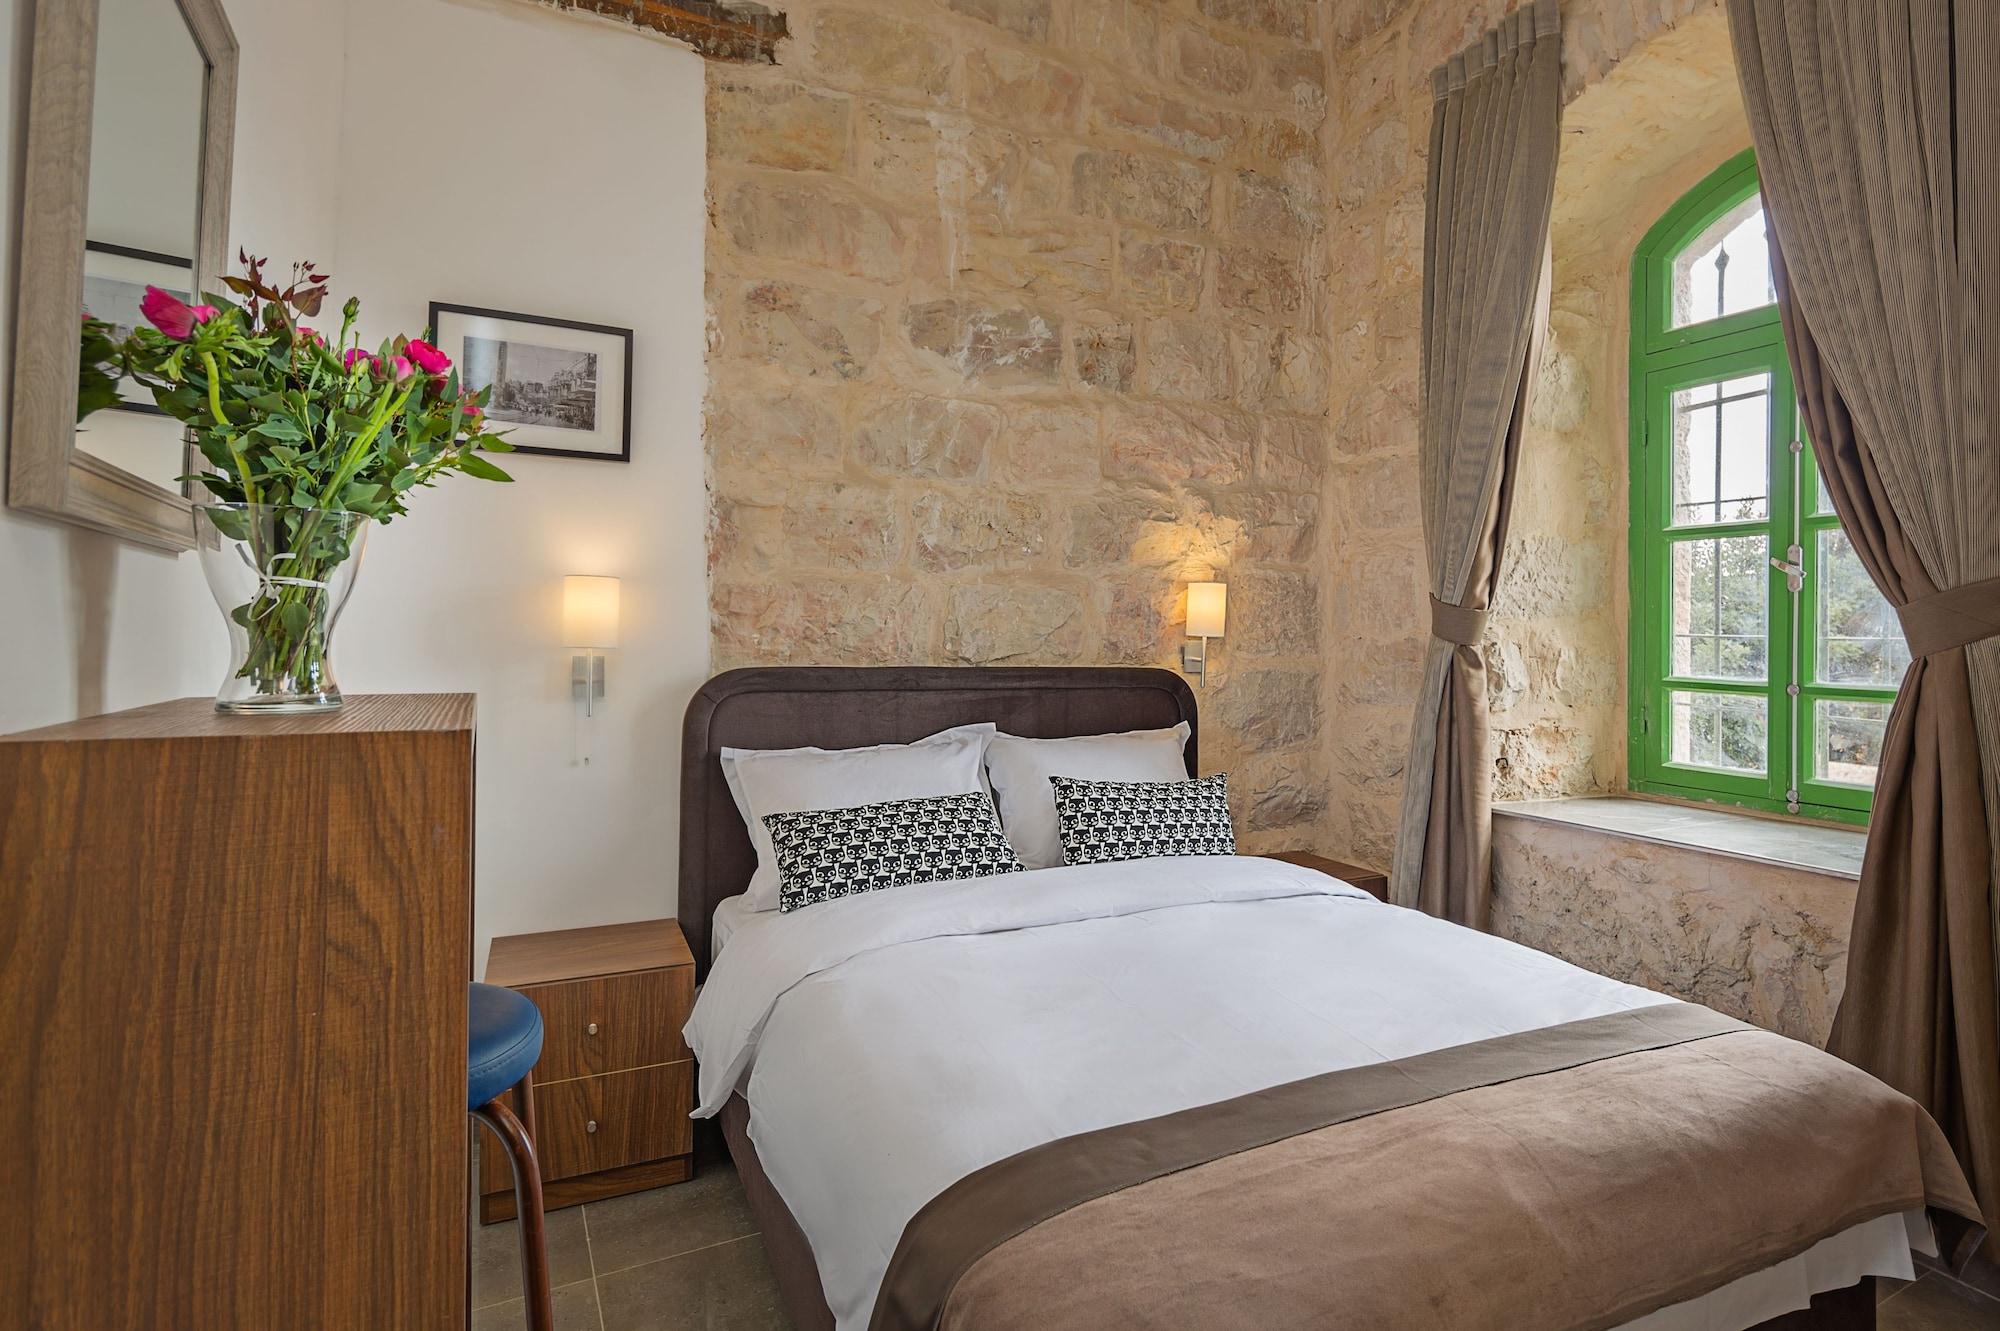 Hotel Malka, Jerusalem